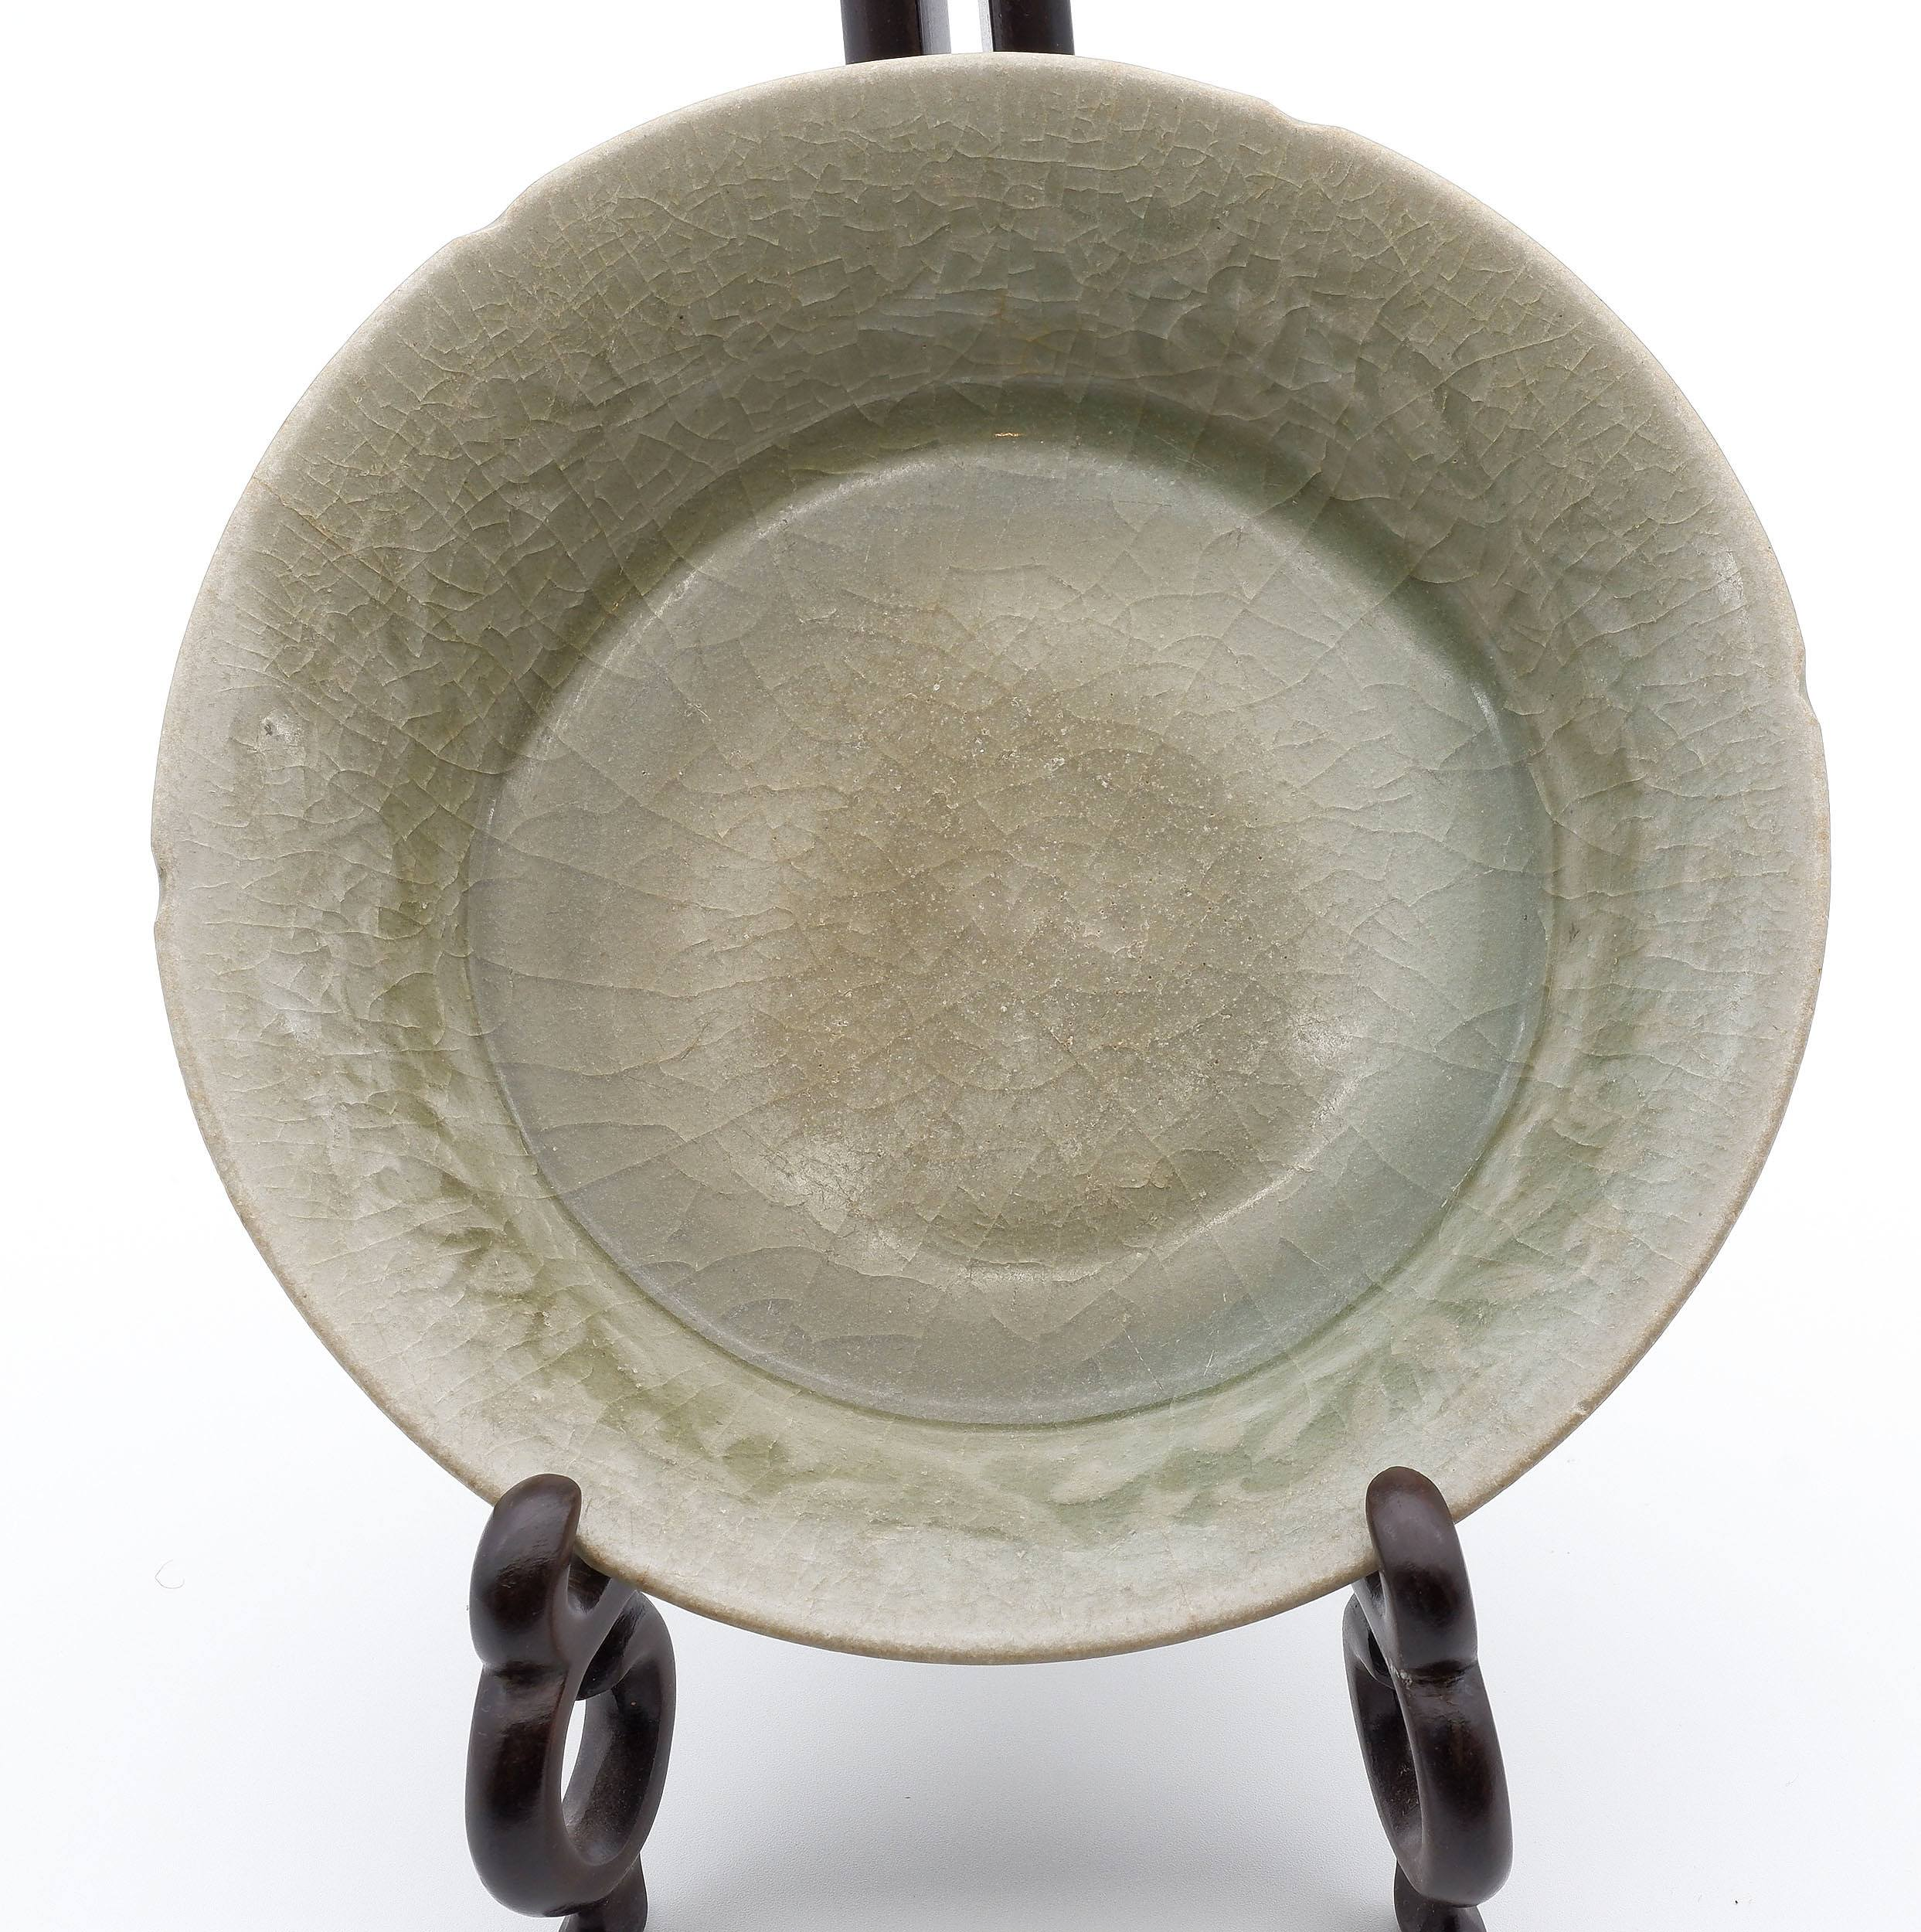 'Korean Celadon Dish with Carved Foliate Decoration, Koryo Goryeo Dynasty (918-1392)'